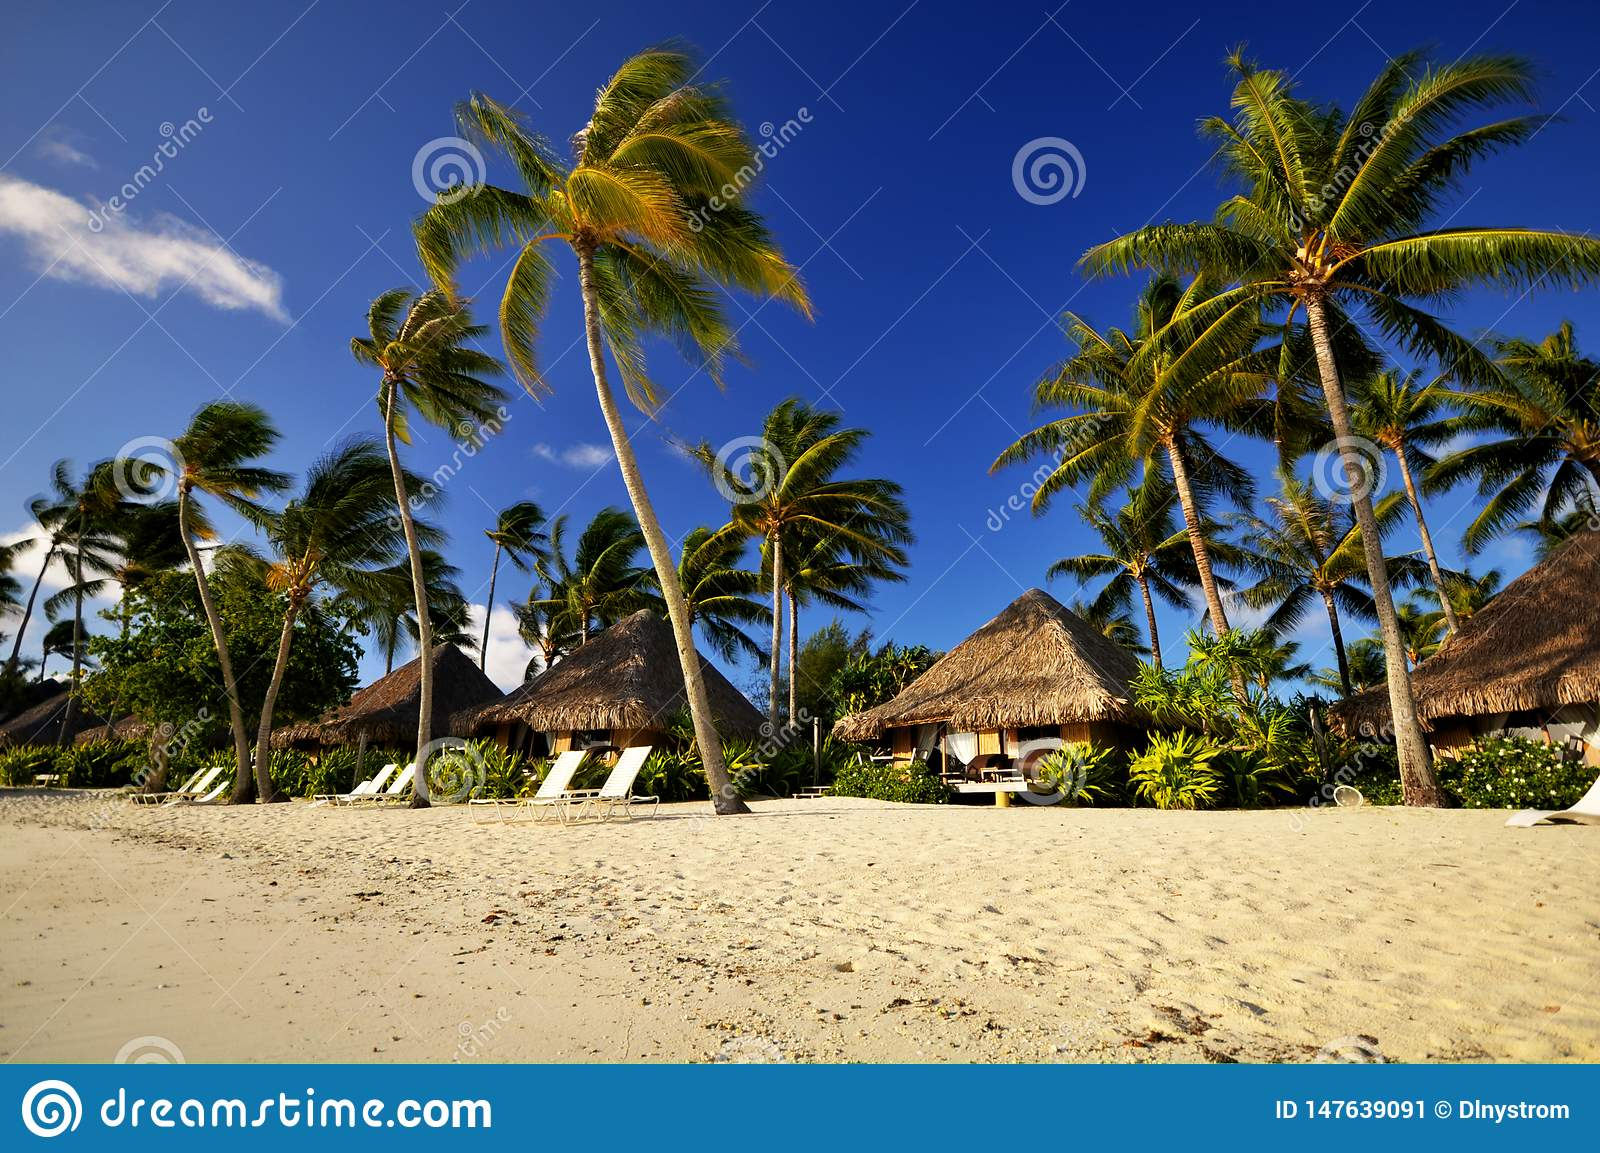 Beach Resort With Bungalows In Bora Bora Stock Image Image